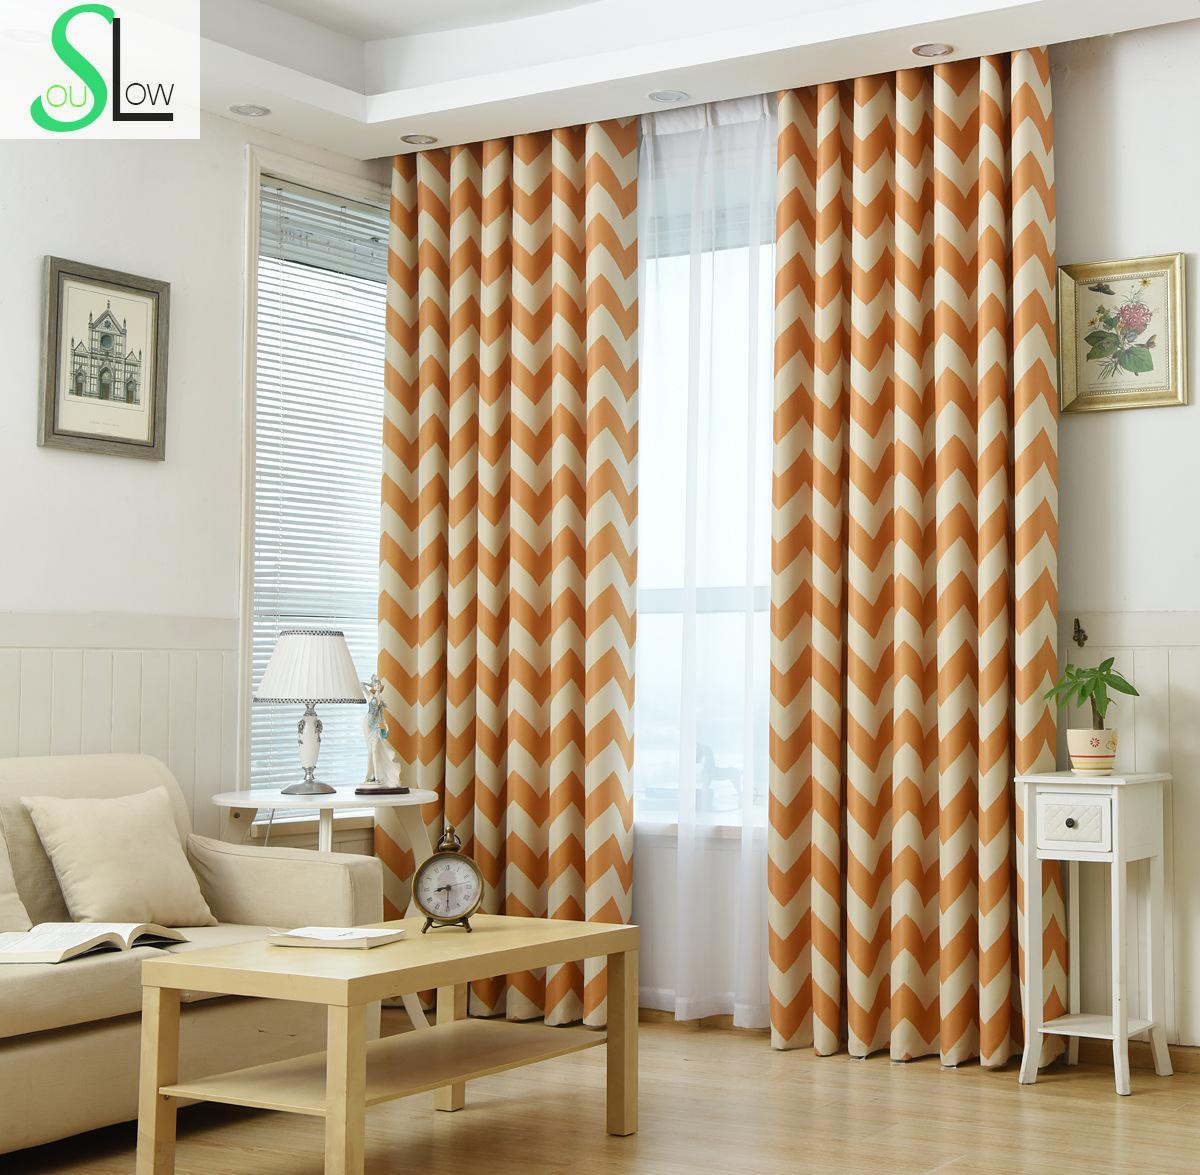 Slow Soul azul claro amarillo oscuro cortina impreso rayas cortinas ...